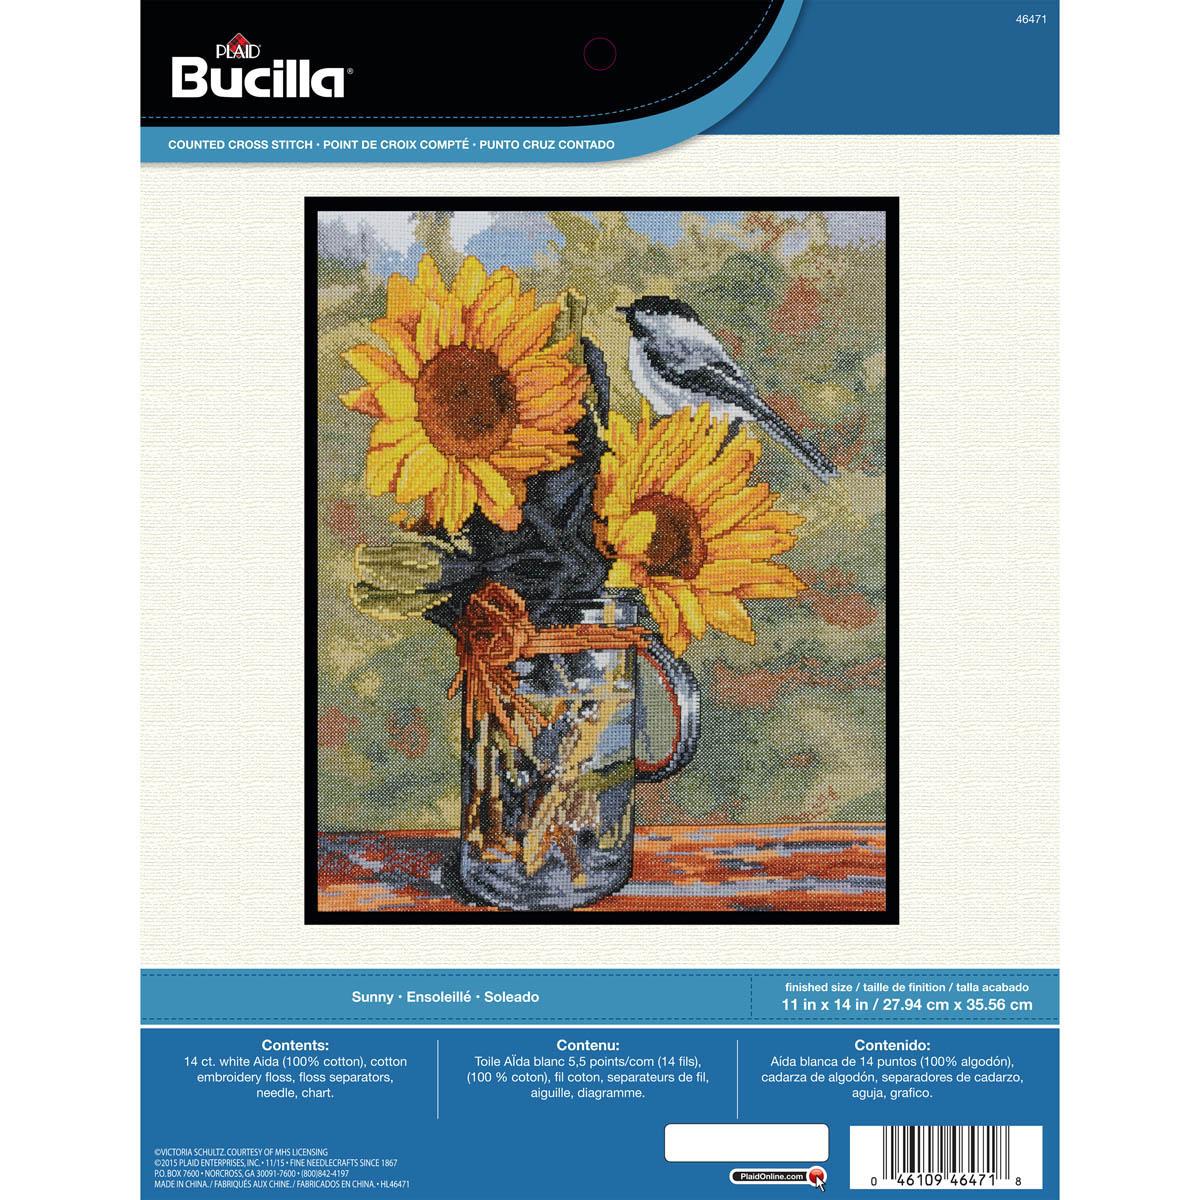 Bucilla ® Counted Cross Stitch - Picture Kits - Sunny